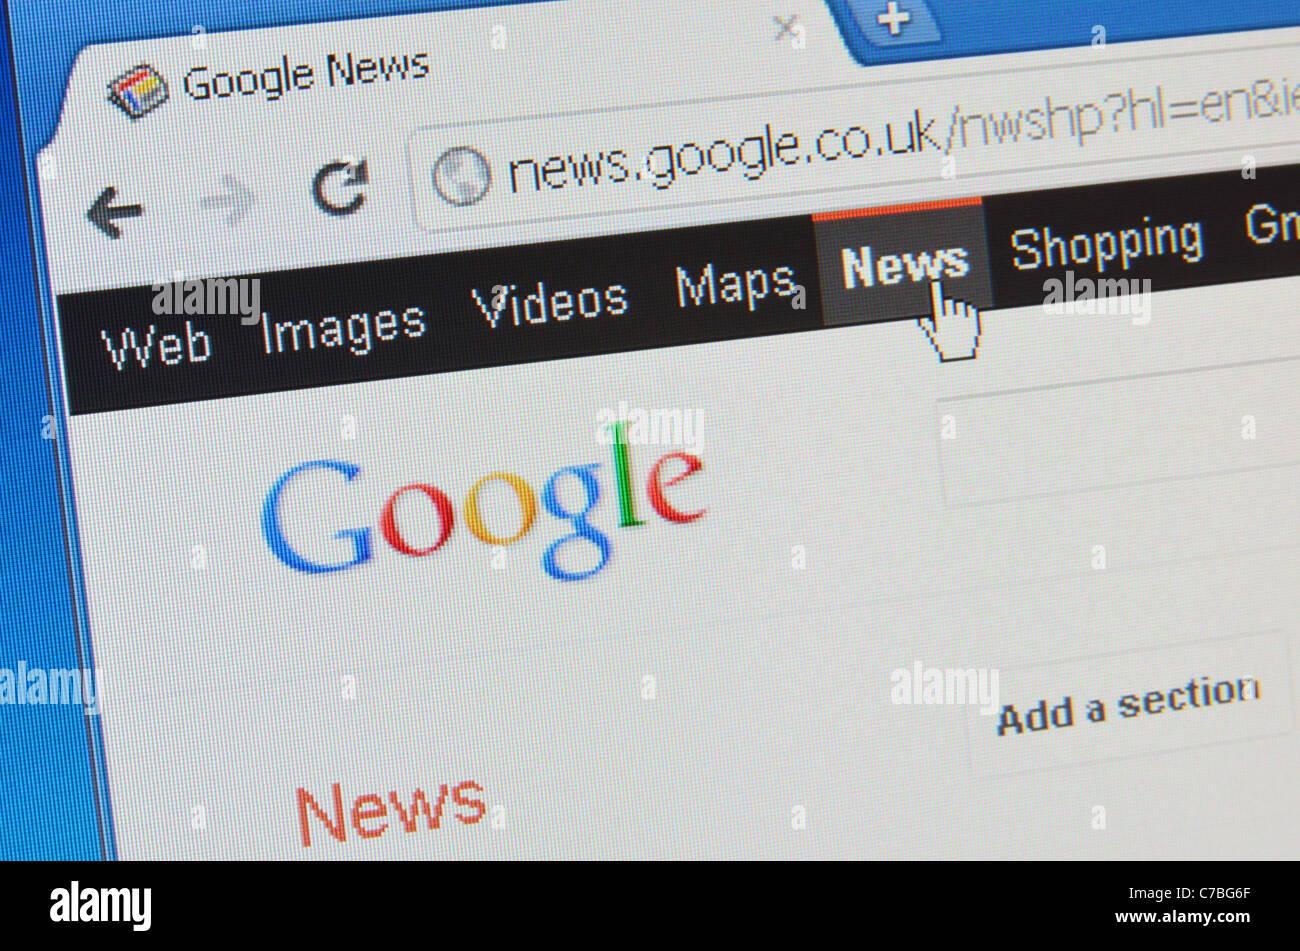 Google News screenshot - Stock Image